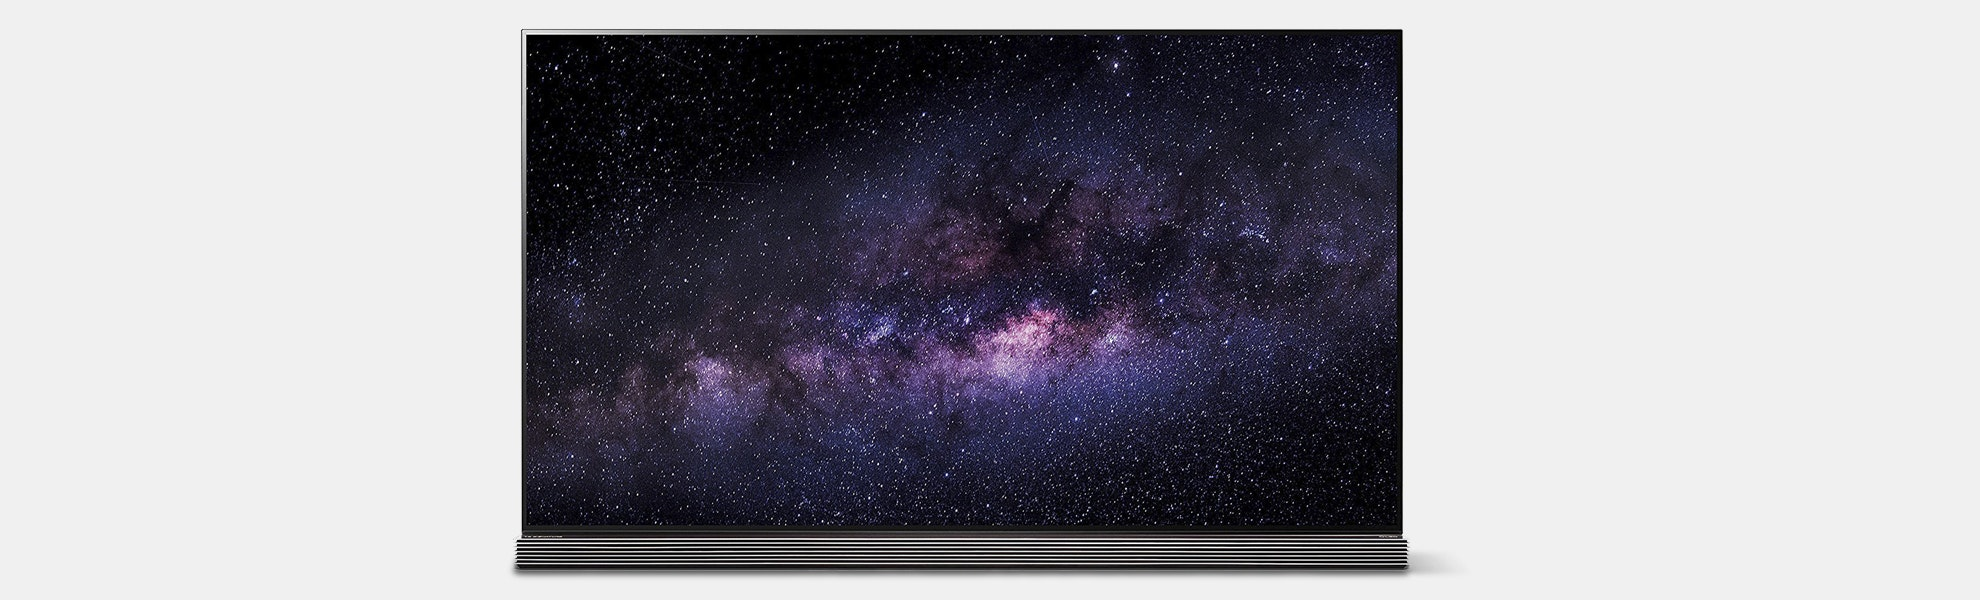 LG 65 77-inch Signature OLED 4K Ultra HDR Smart TV